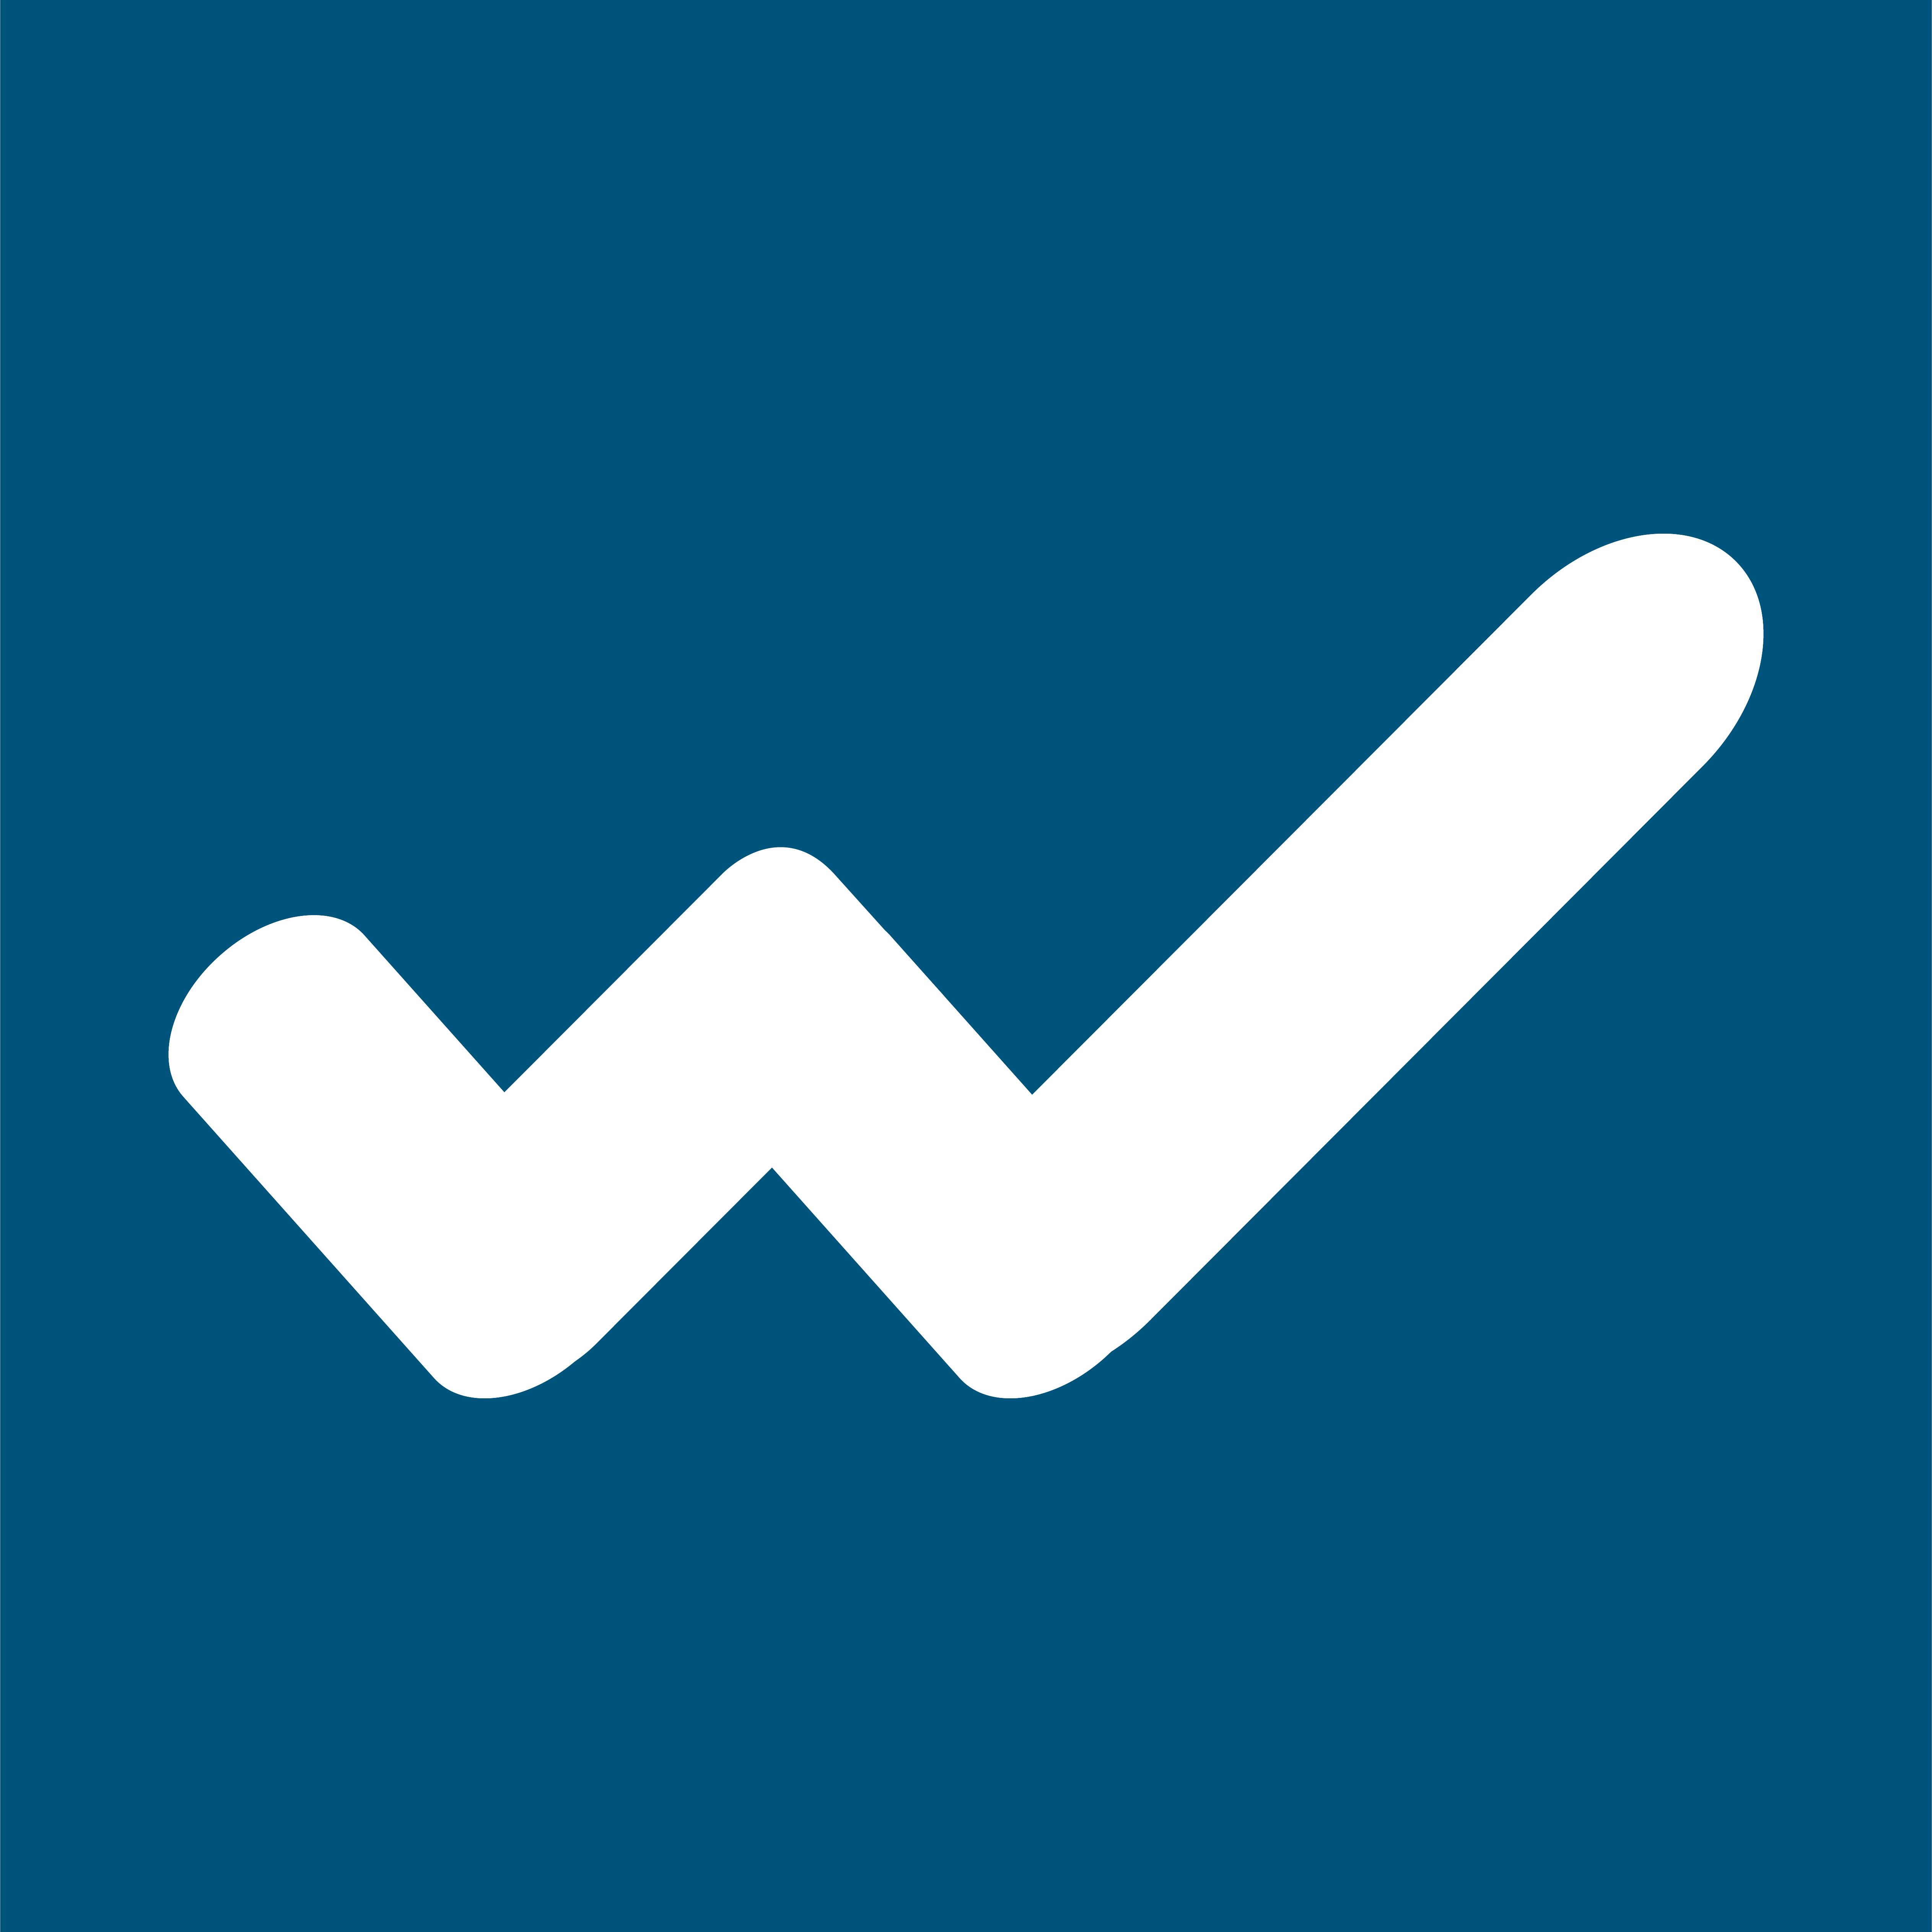 File:Logo weby.png.